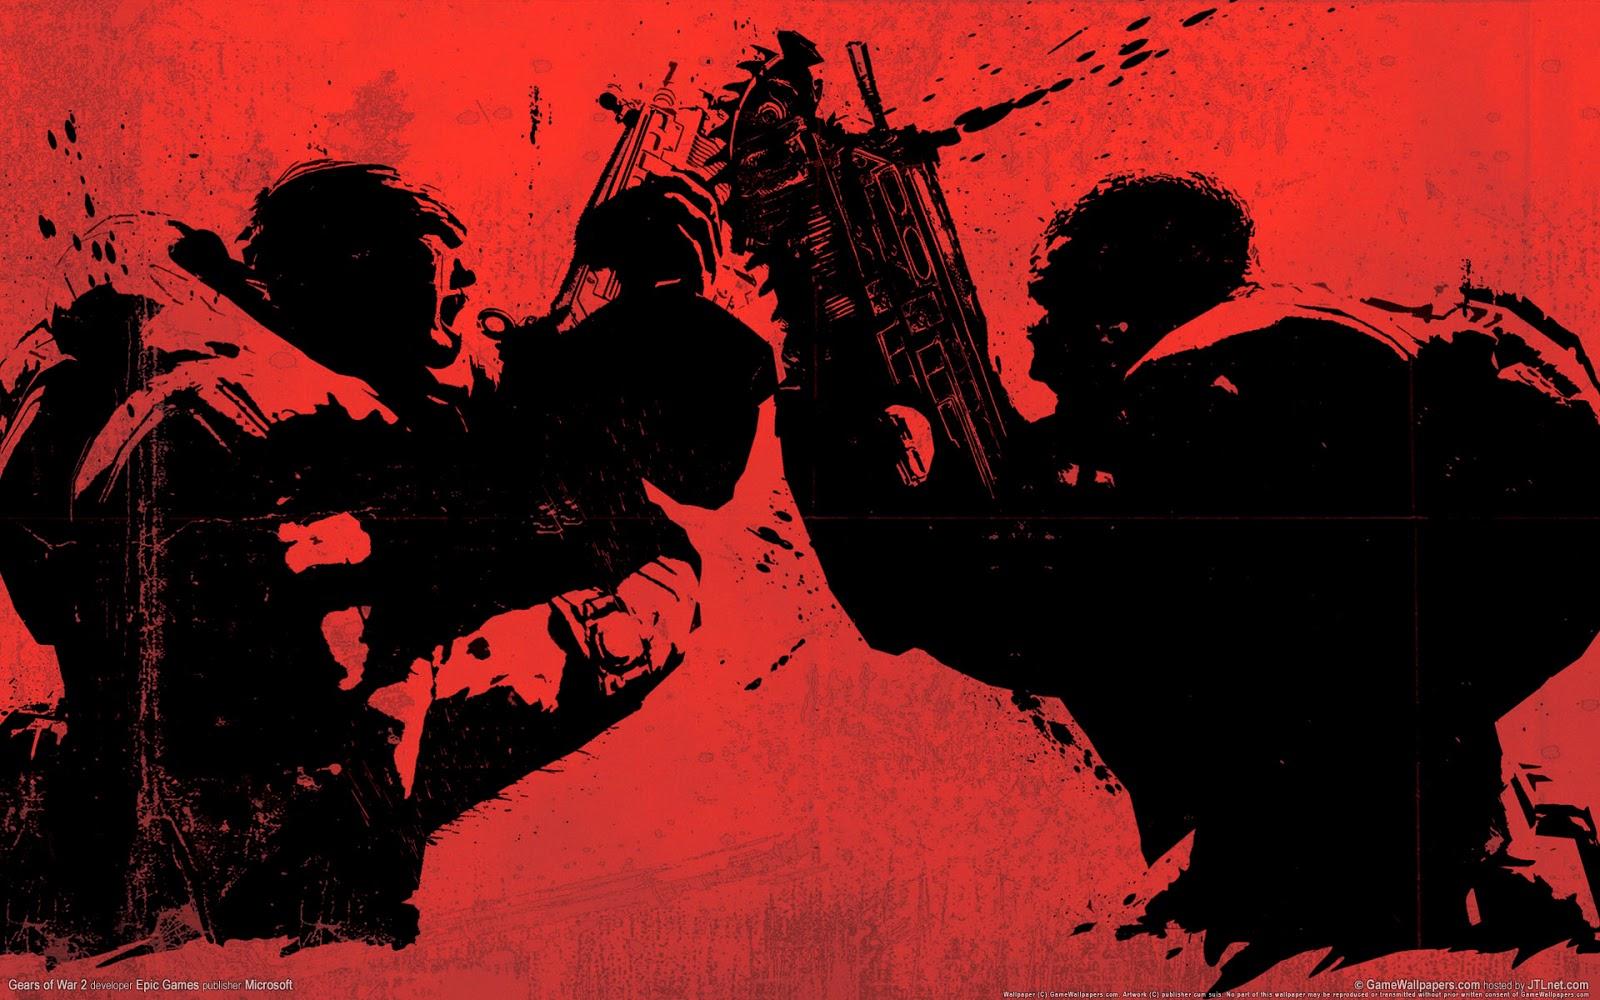 http://2.bp.blogspot.com/-GkT9eWTxS-c/ULr6k-QoJAI/AAAAAAAADKA/ecj1igVEj8w/s1600/wallpaper_gears_of_war_2_02_1920x1200.jpg